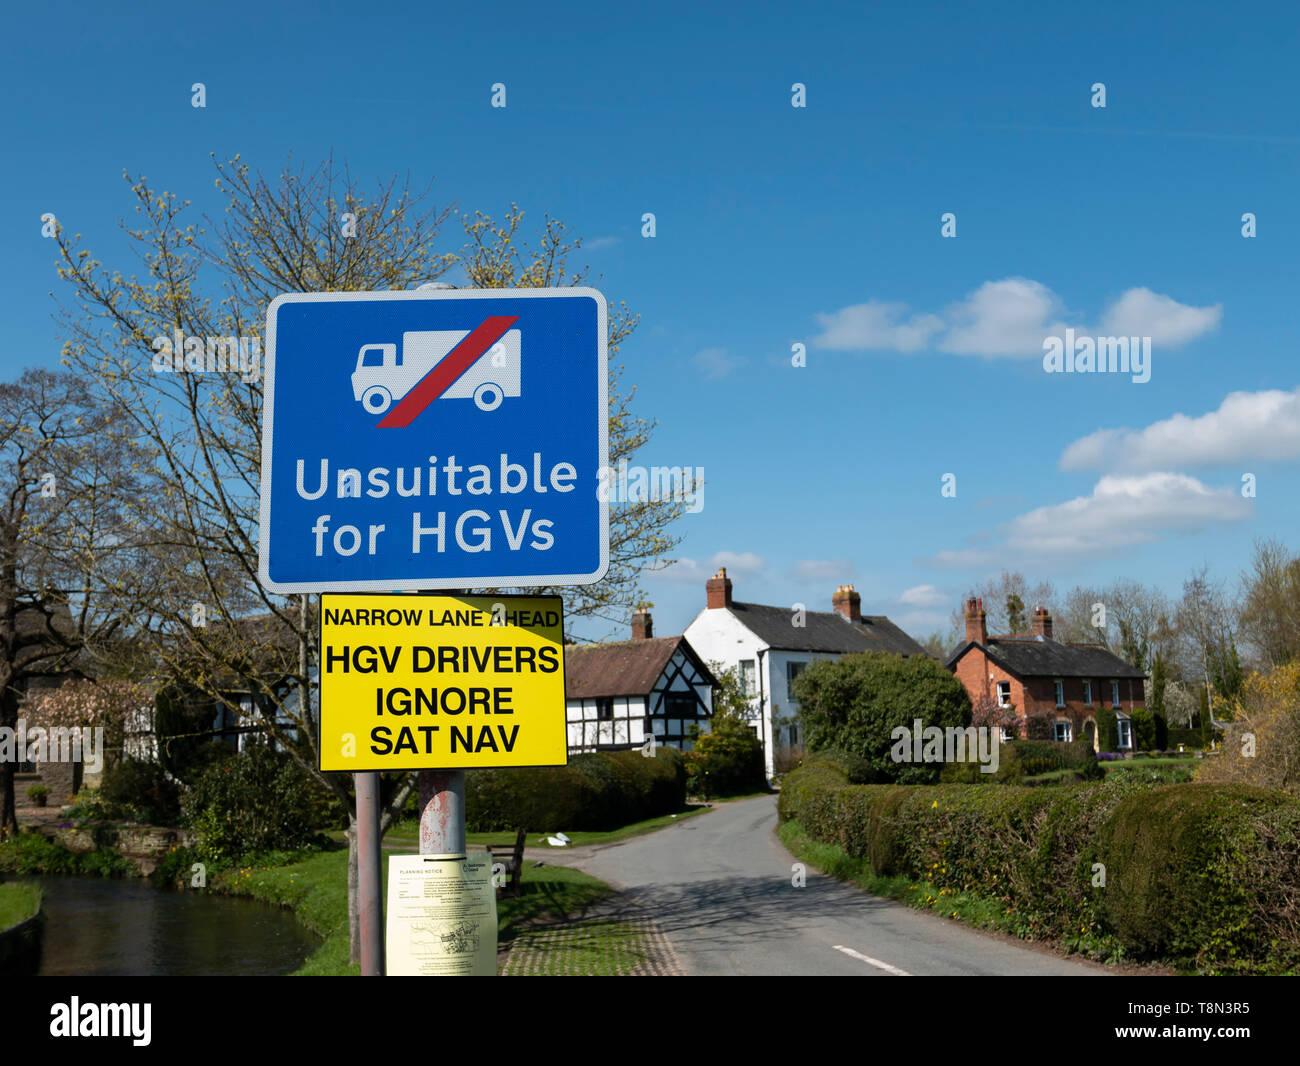 Unsuitable for HGVs sign, Eardisland village, Herefordshire, England, UK. - Stock Image